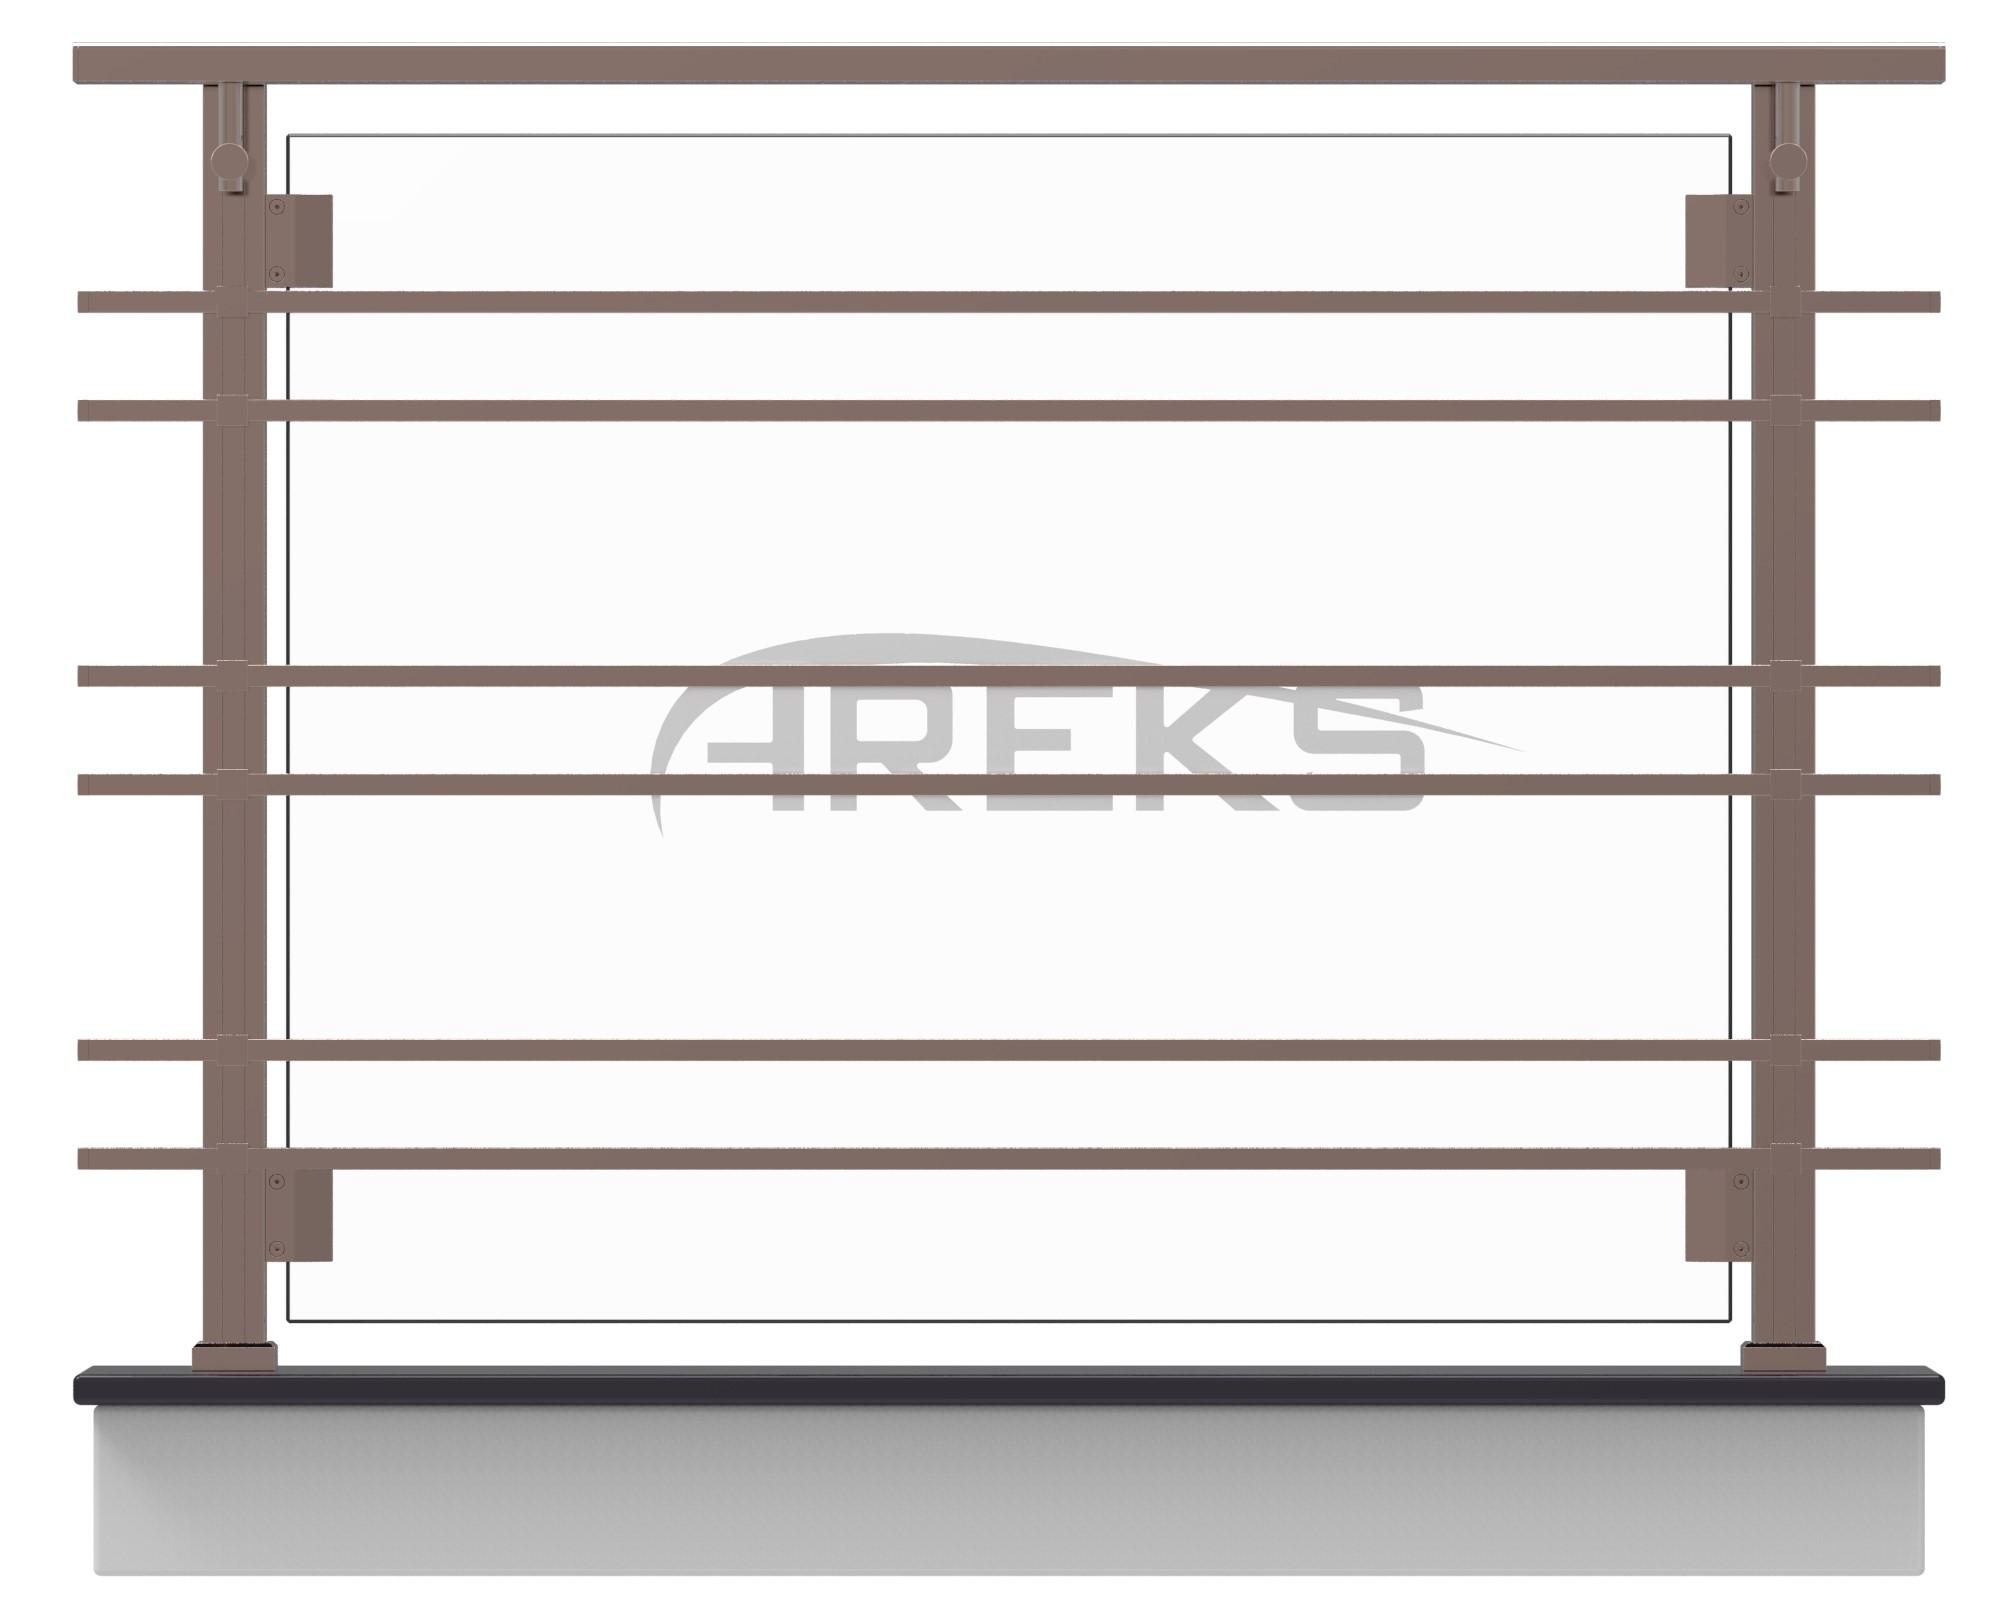 KARE KORKULUK UYGULAMA aluminium railing Aluminium glass railing Aluminium fence